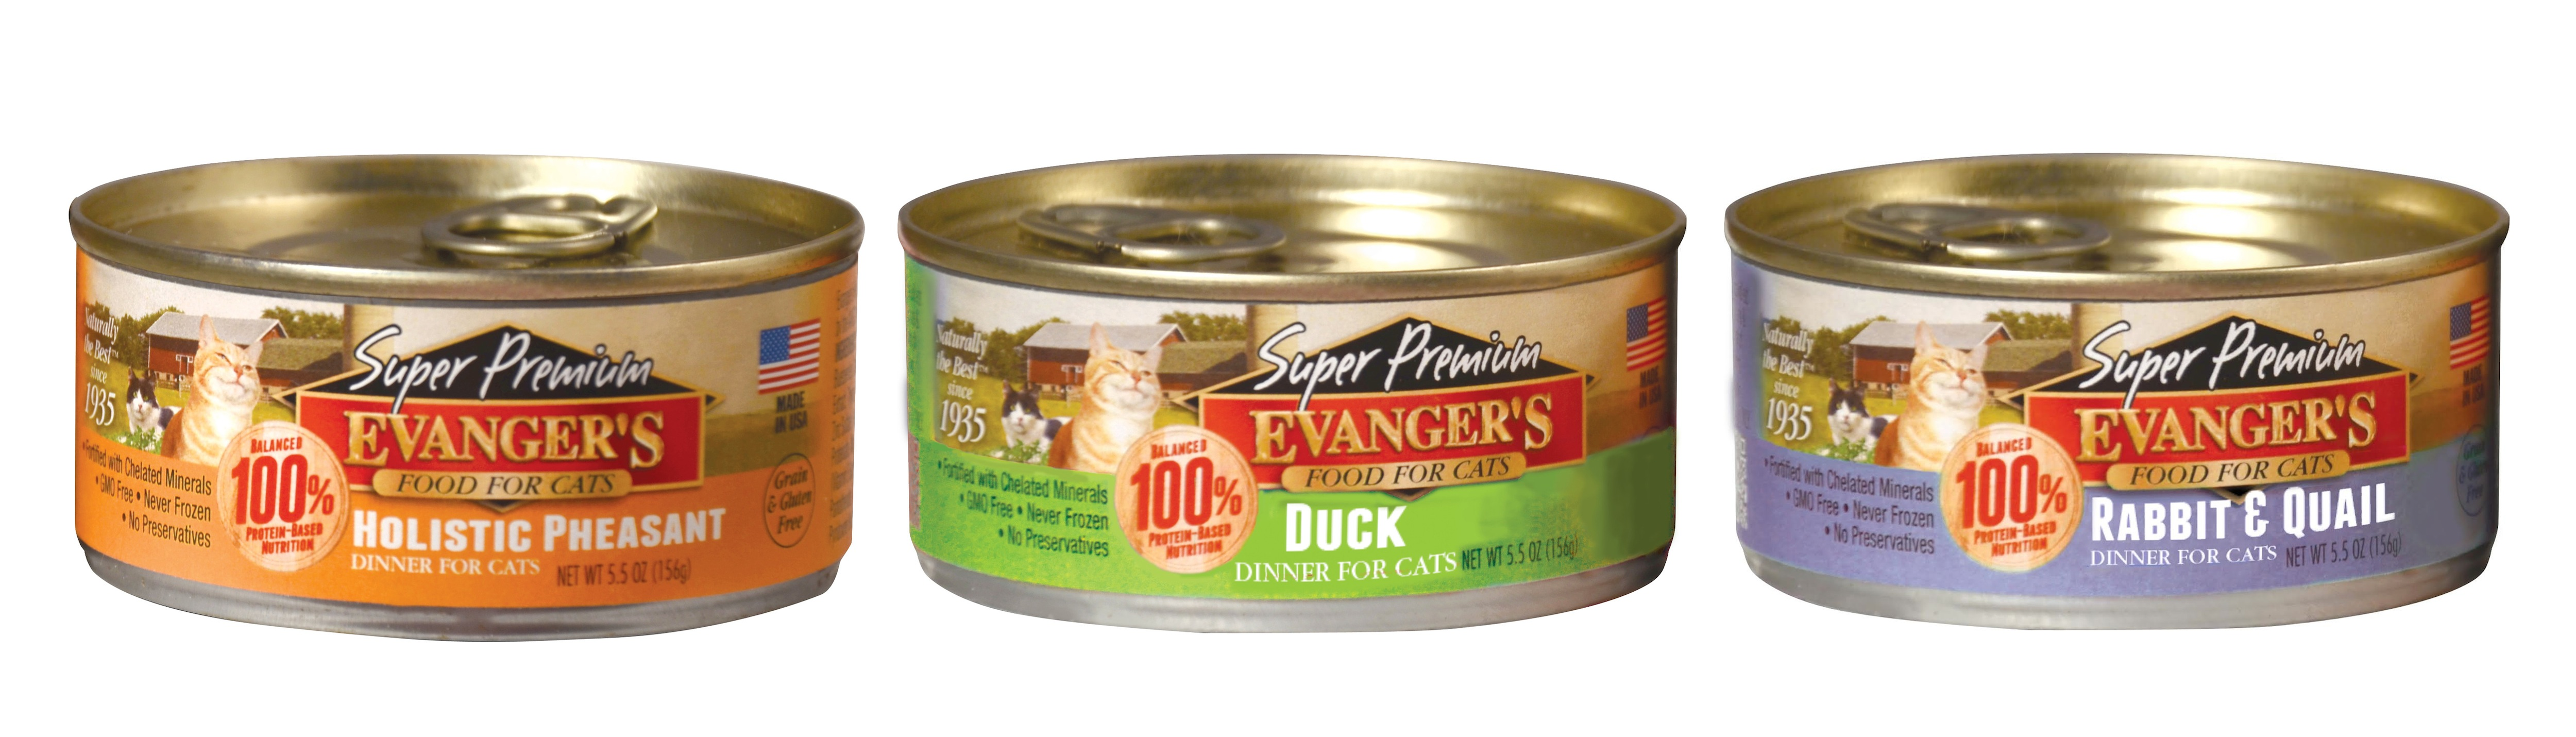 Evangers Dog Food Store Locator